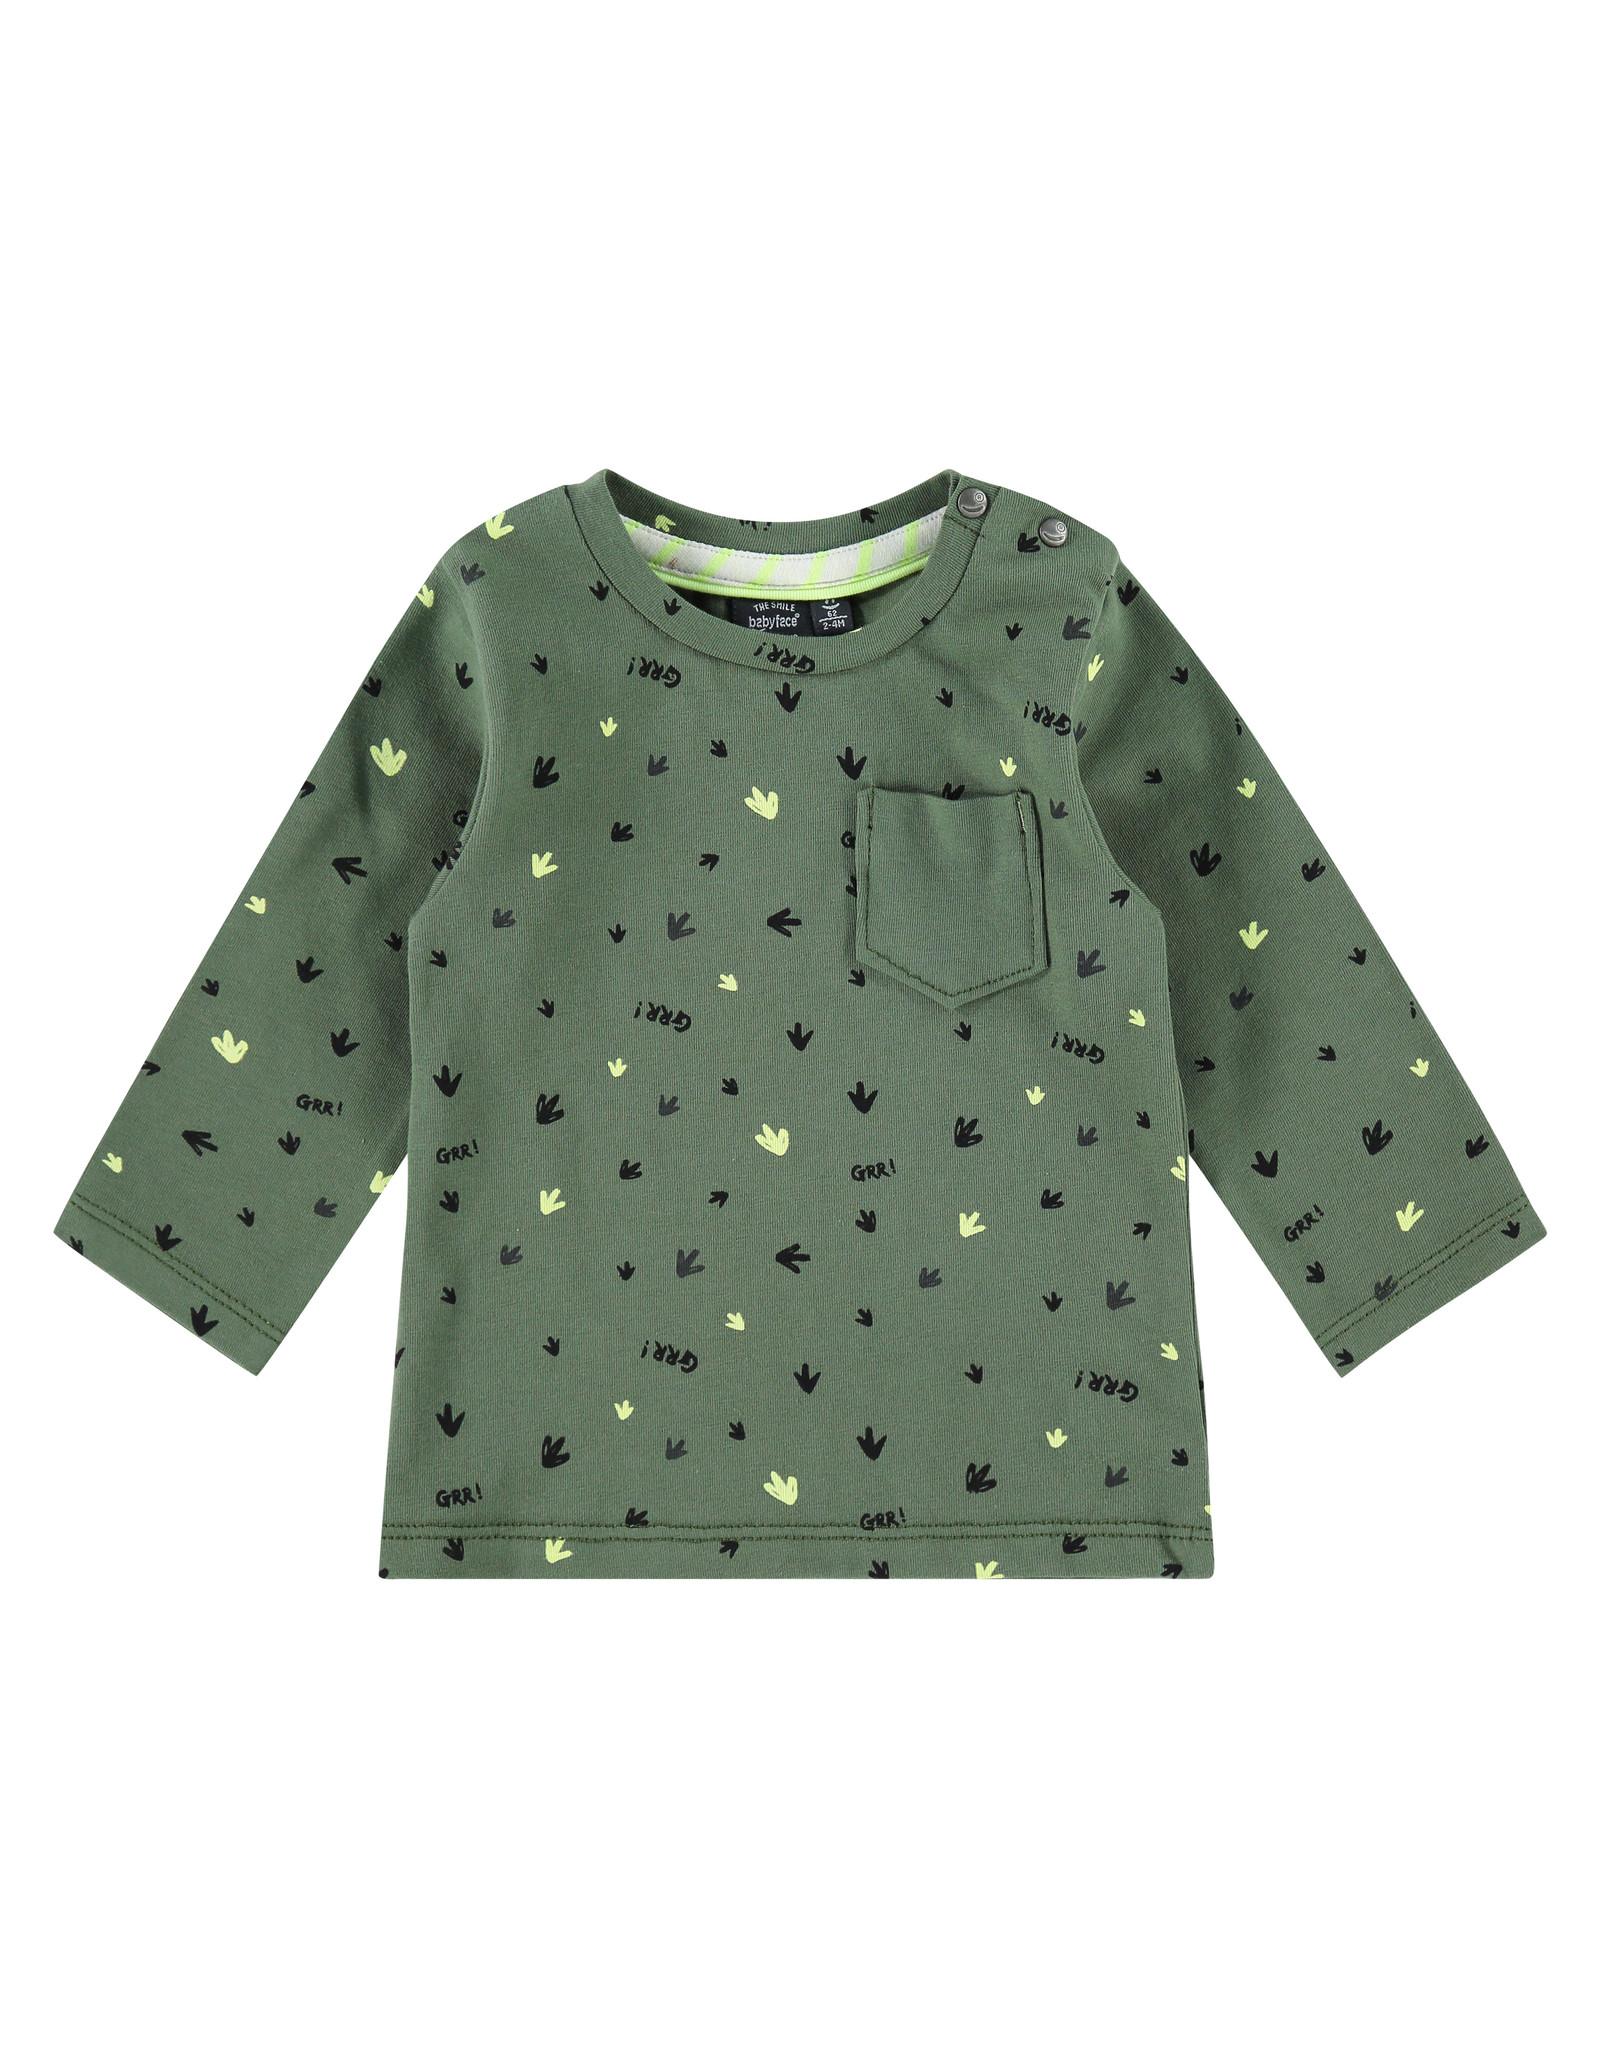 Babyface baby boys t-shirt longsleeve, army